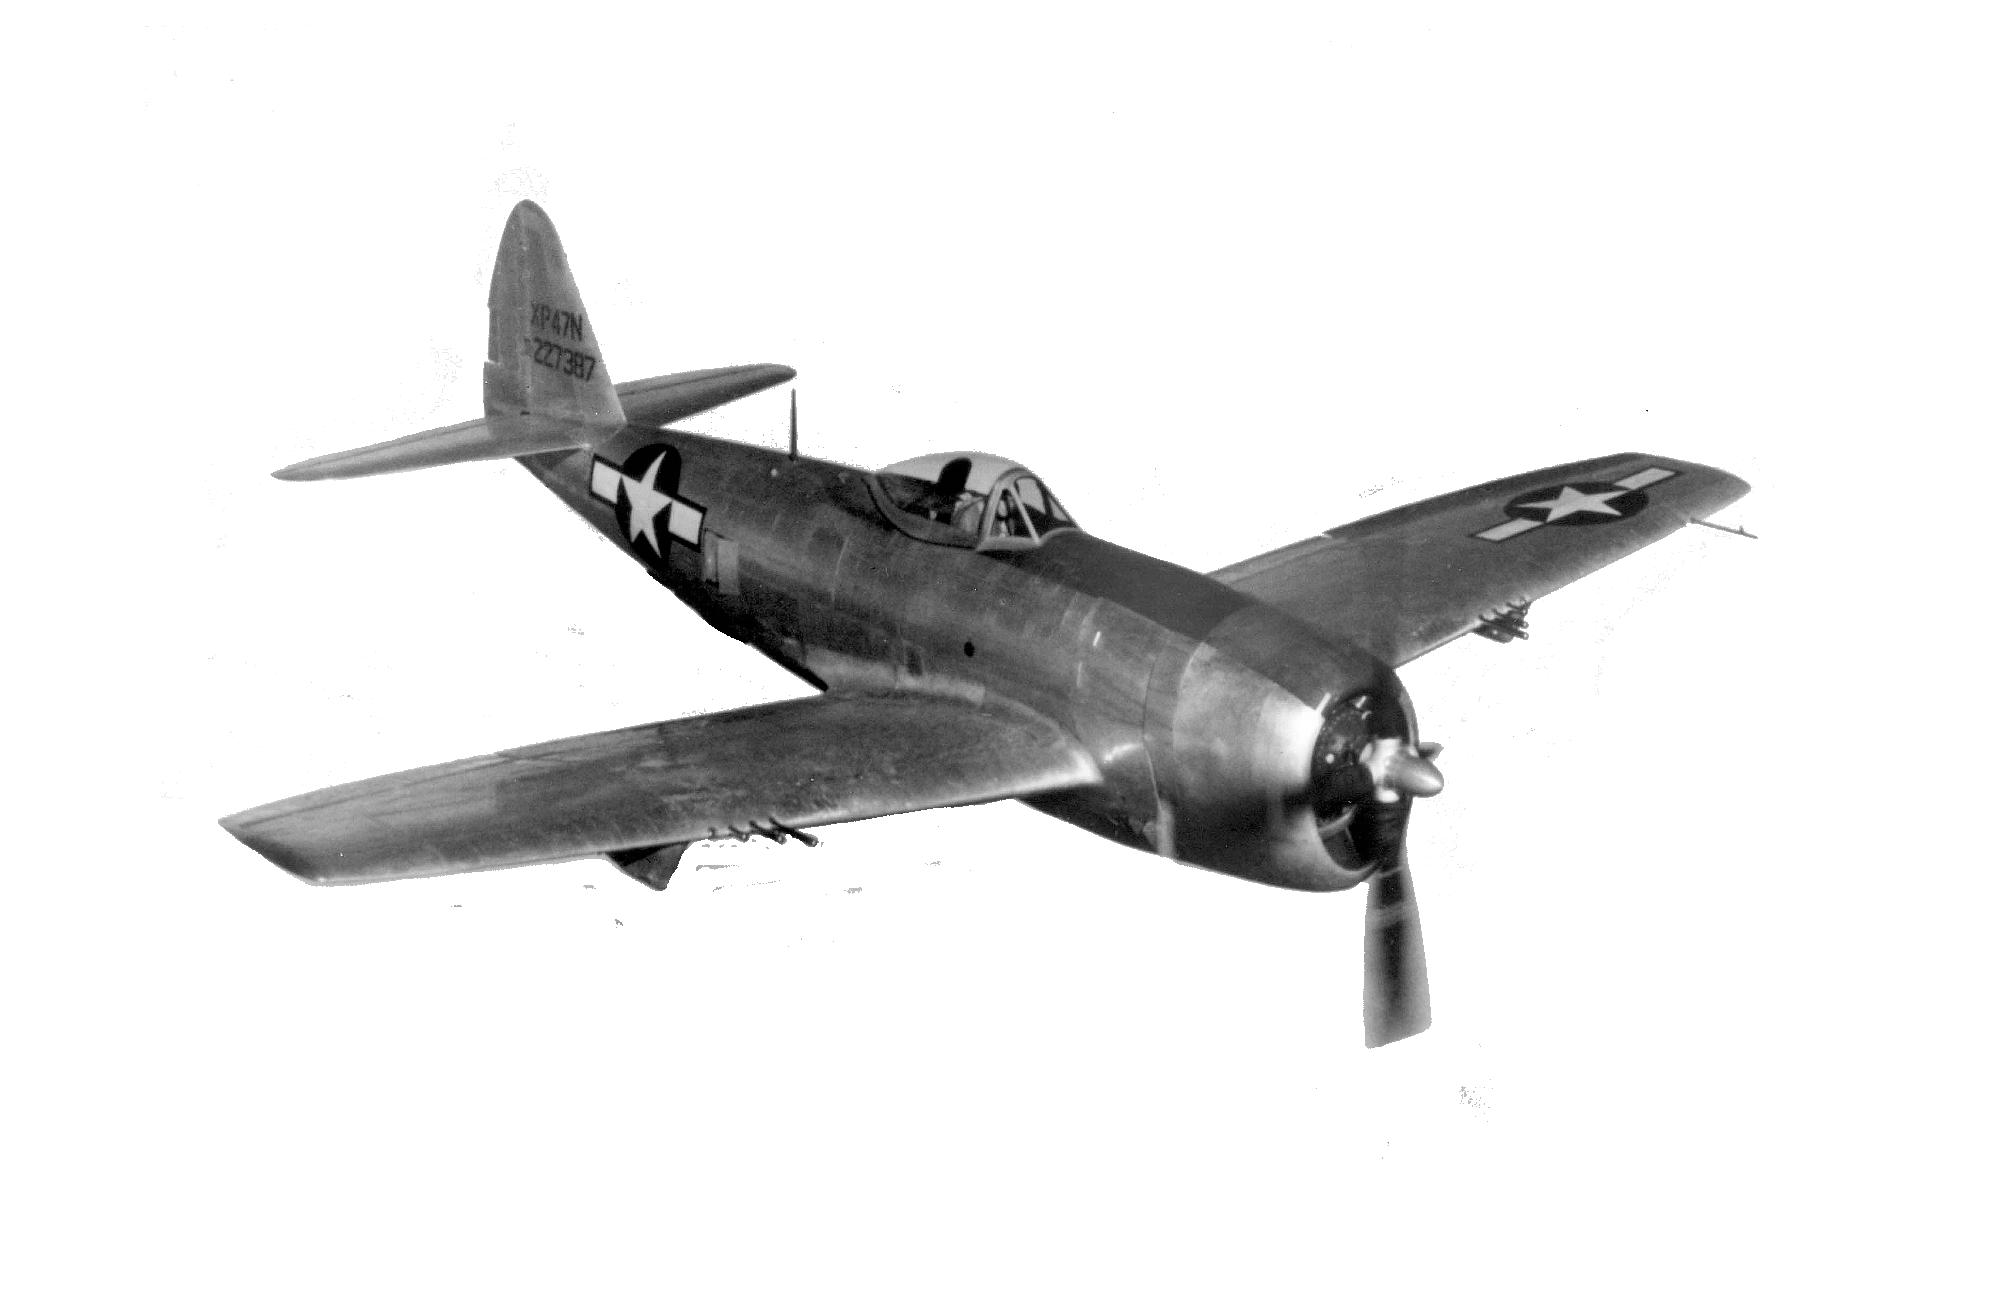 P-47 clipart free Republic P-47 Thunderbolt Airplane Second World War ... free